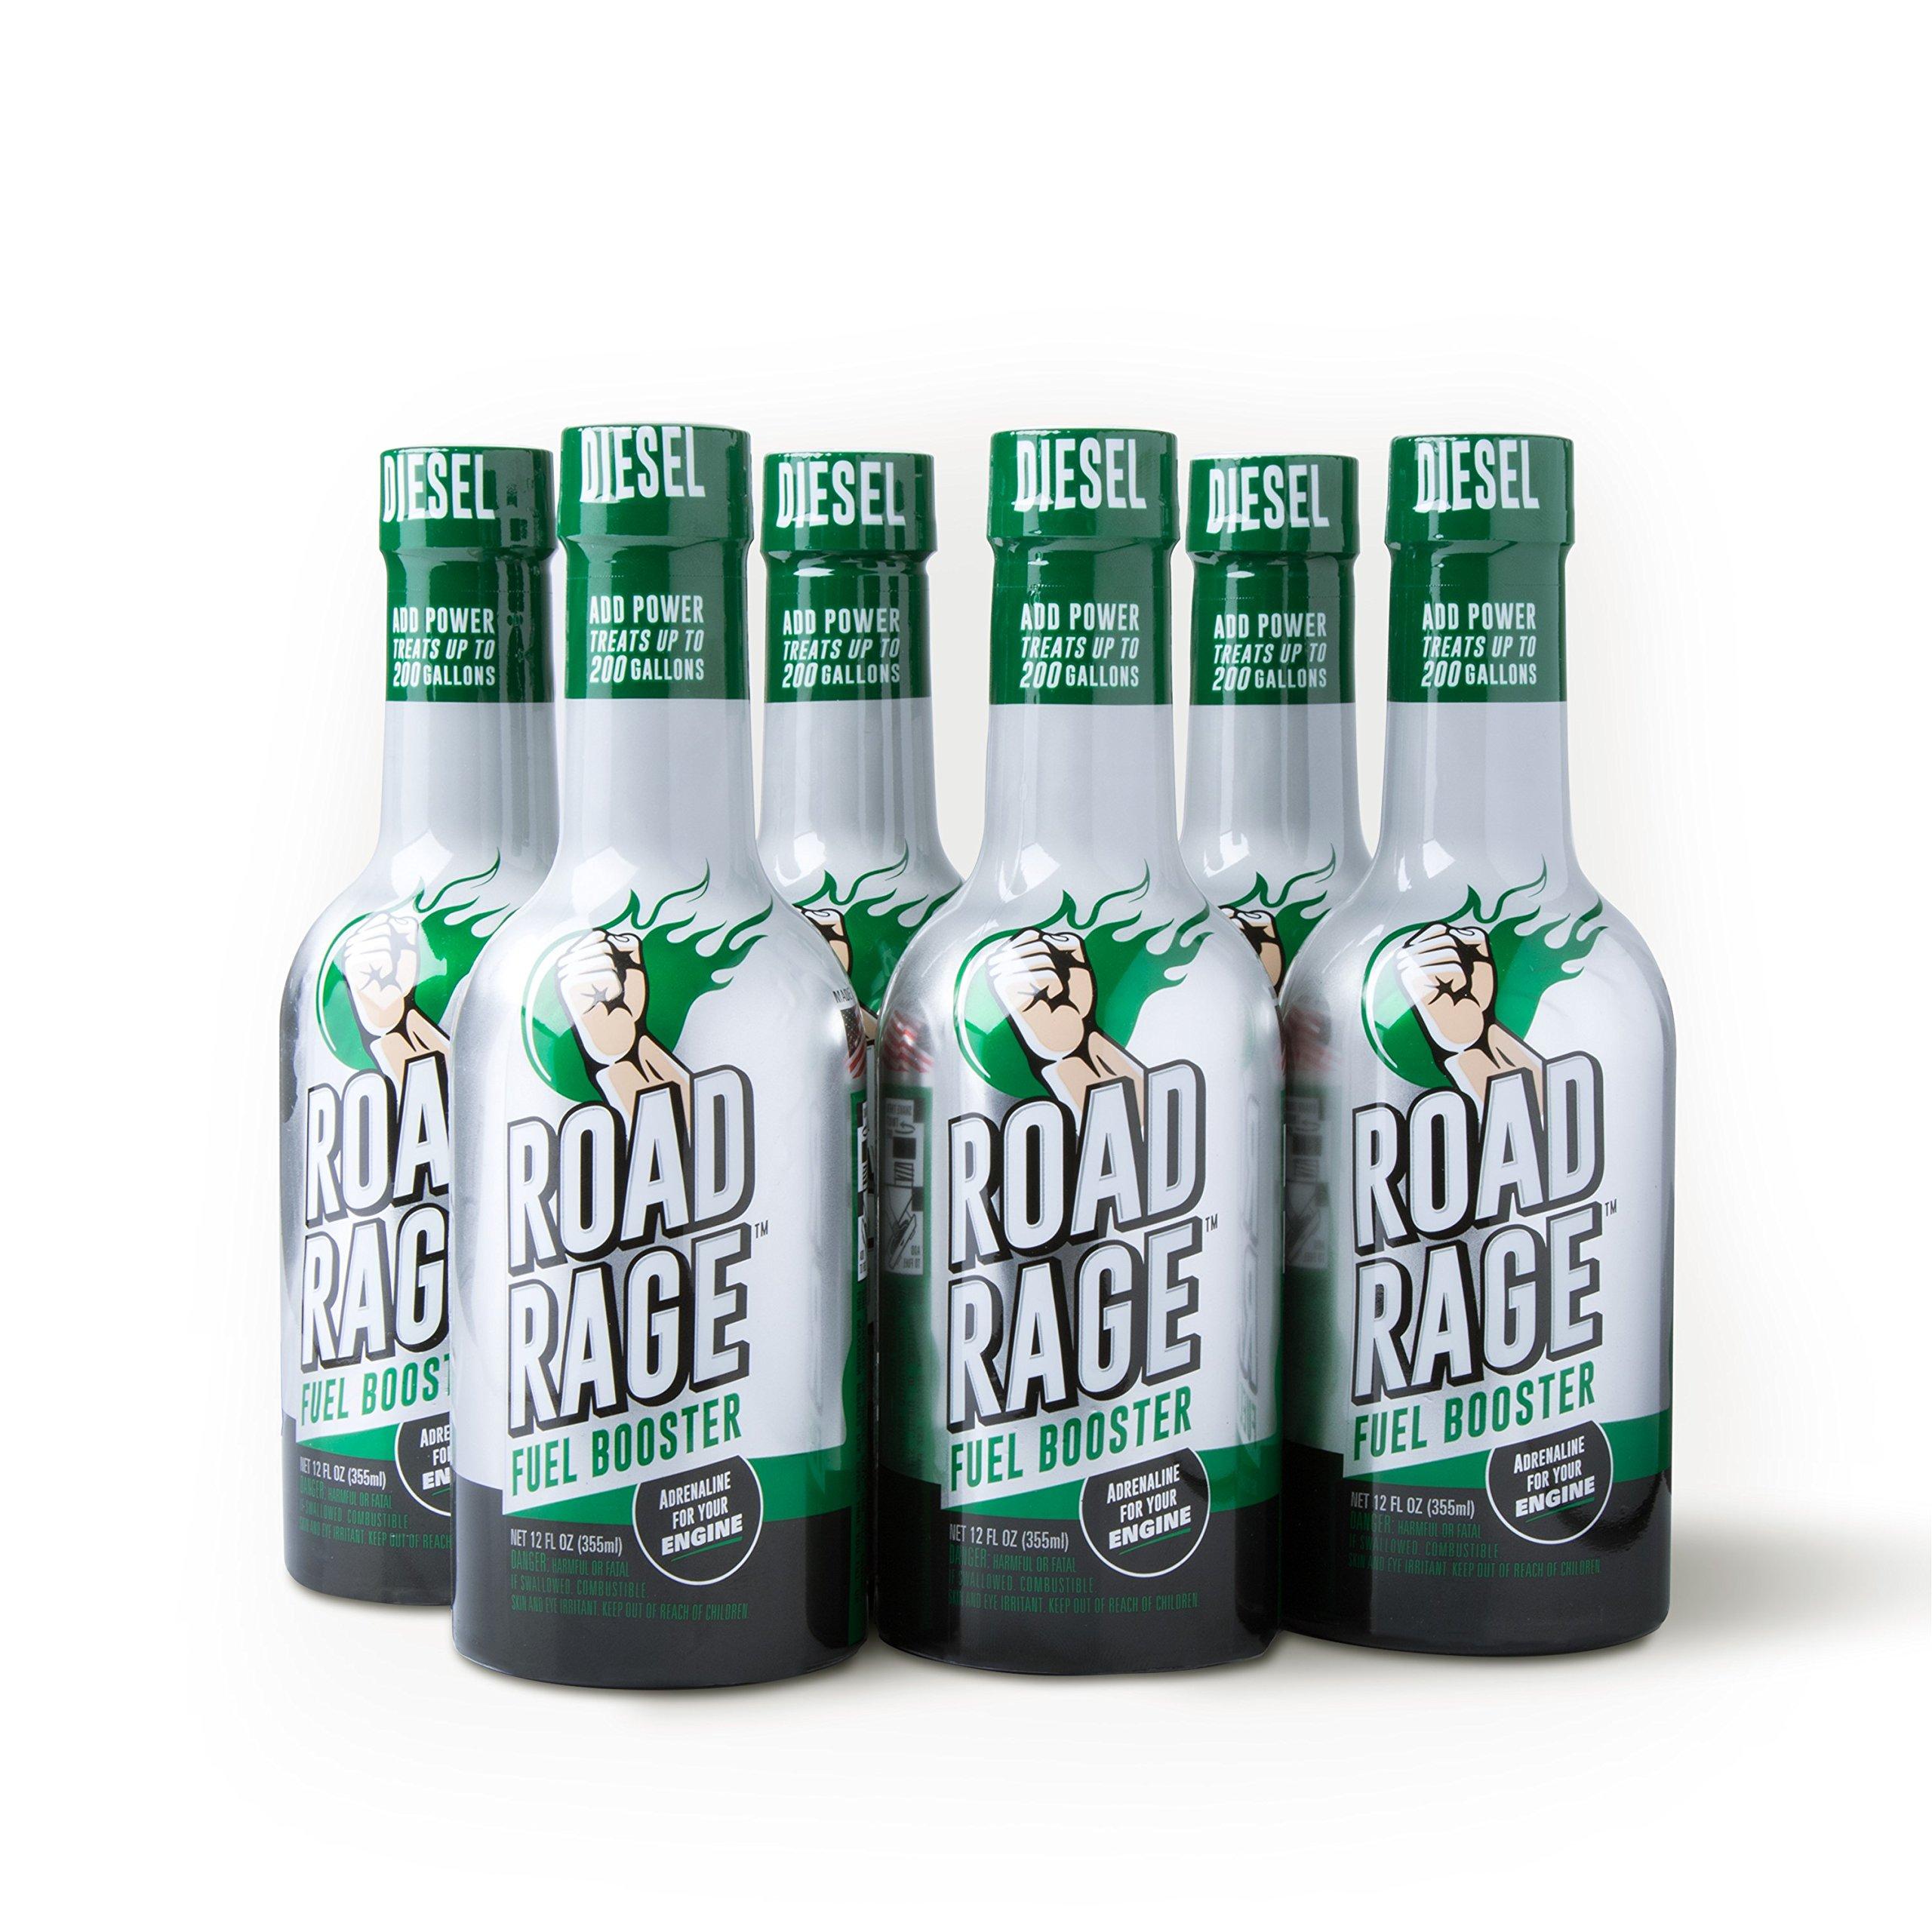 Road Rage Diesel Fuel Booster - (Six 12oz Bottle Case Pack) by Road Rage